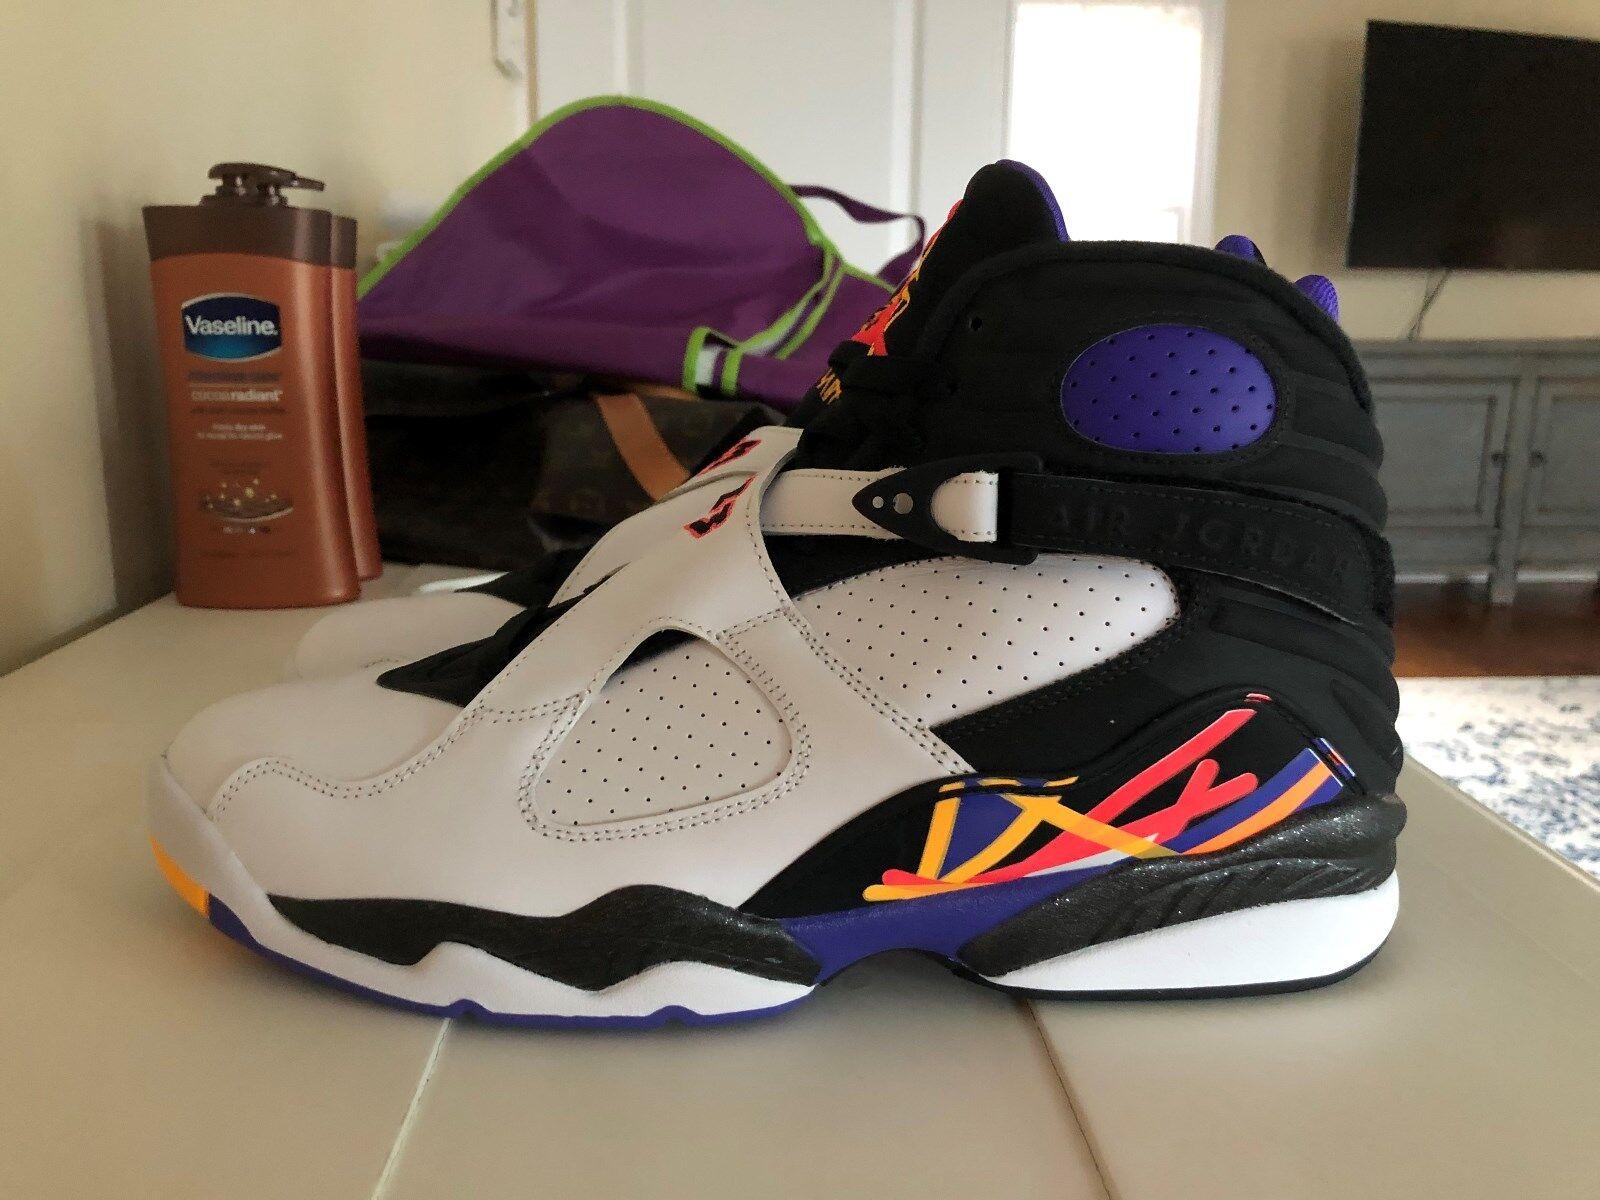 buy online 4ea08 d45f1 Nike Air Jordan 8 8 8 XIII RETRO 79cd85